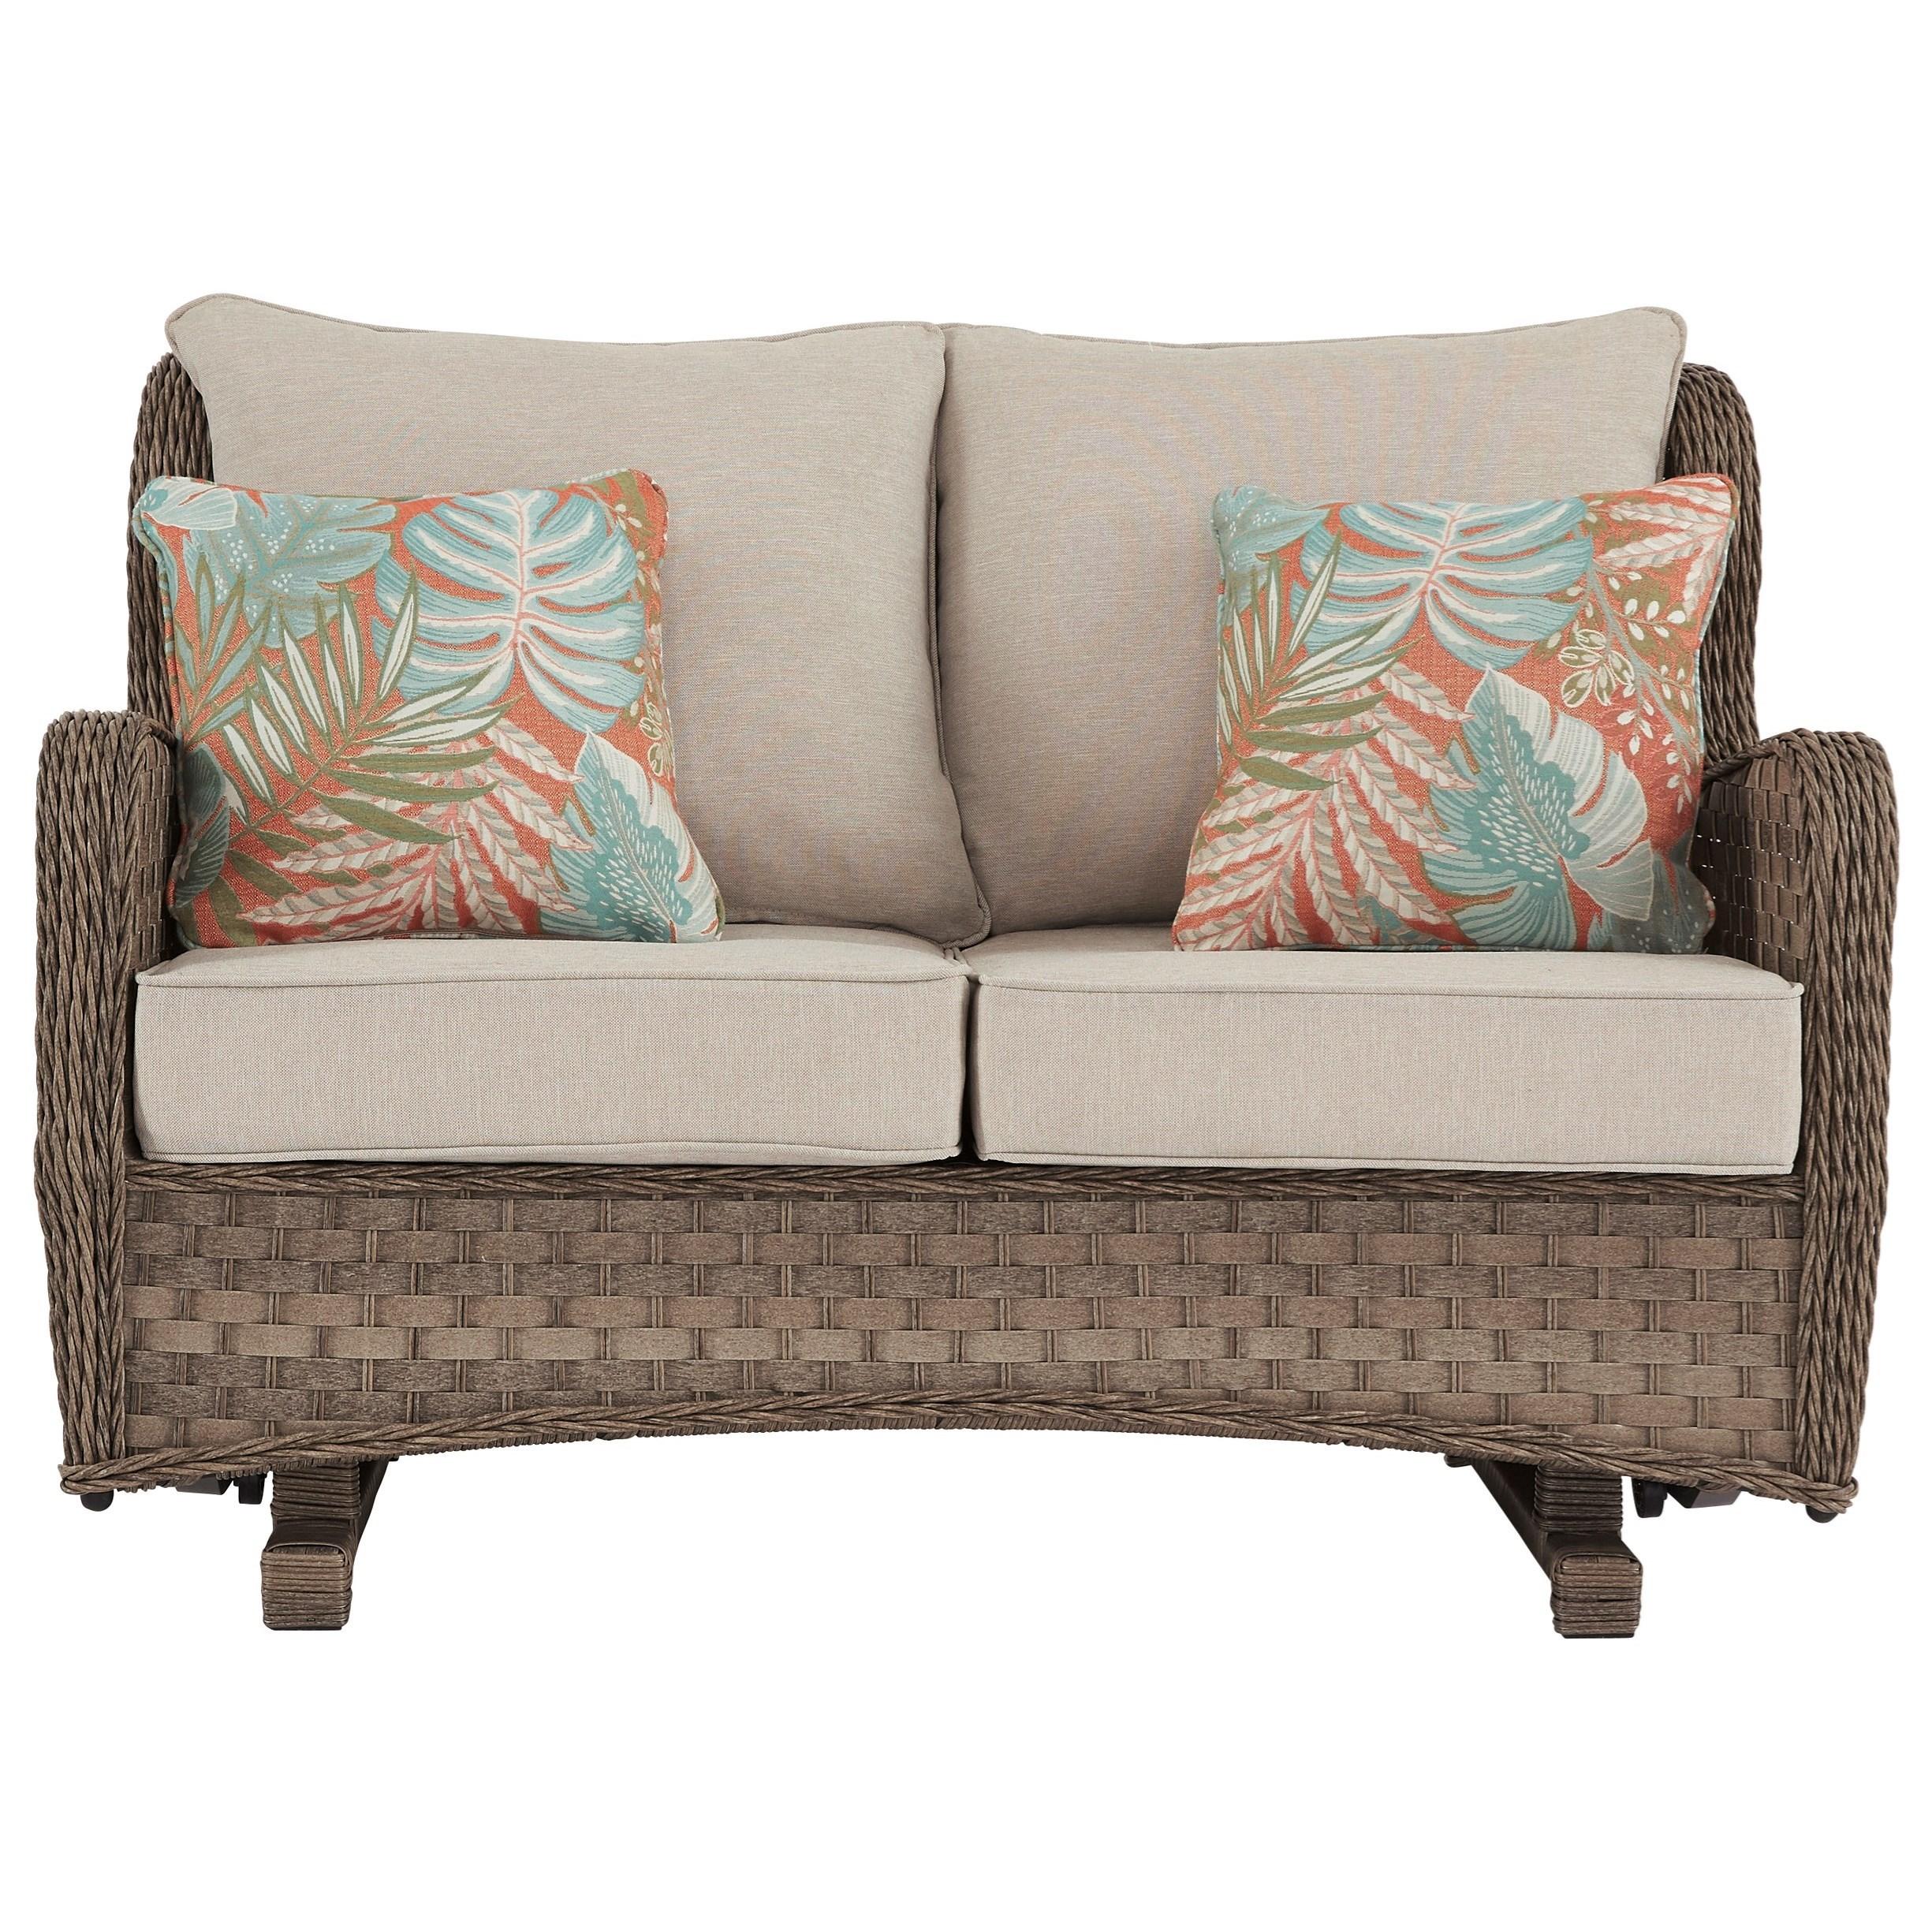 Clear Ridge Loveseat Glider w/ Cushion by Signature at Walker's Furniture